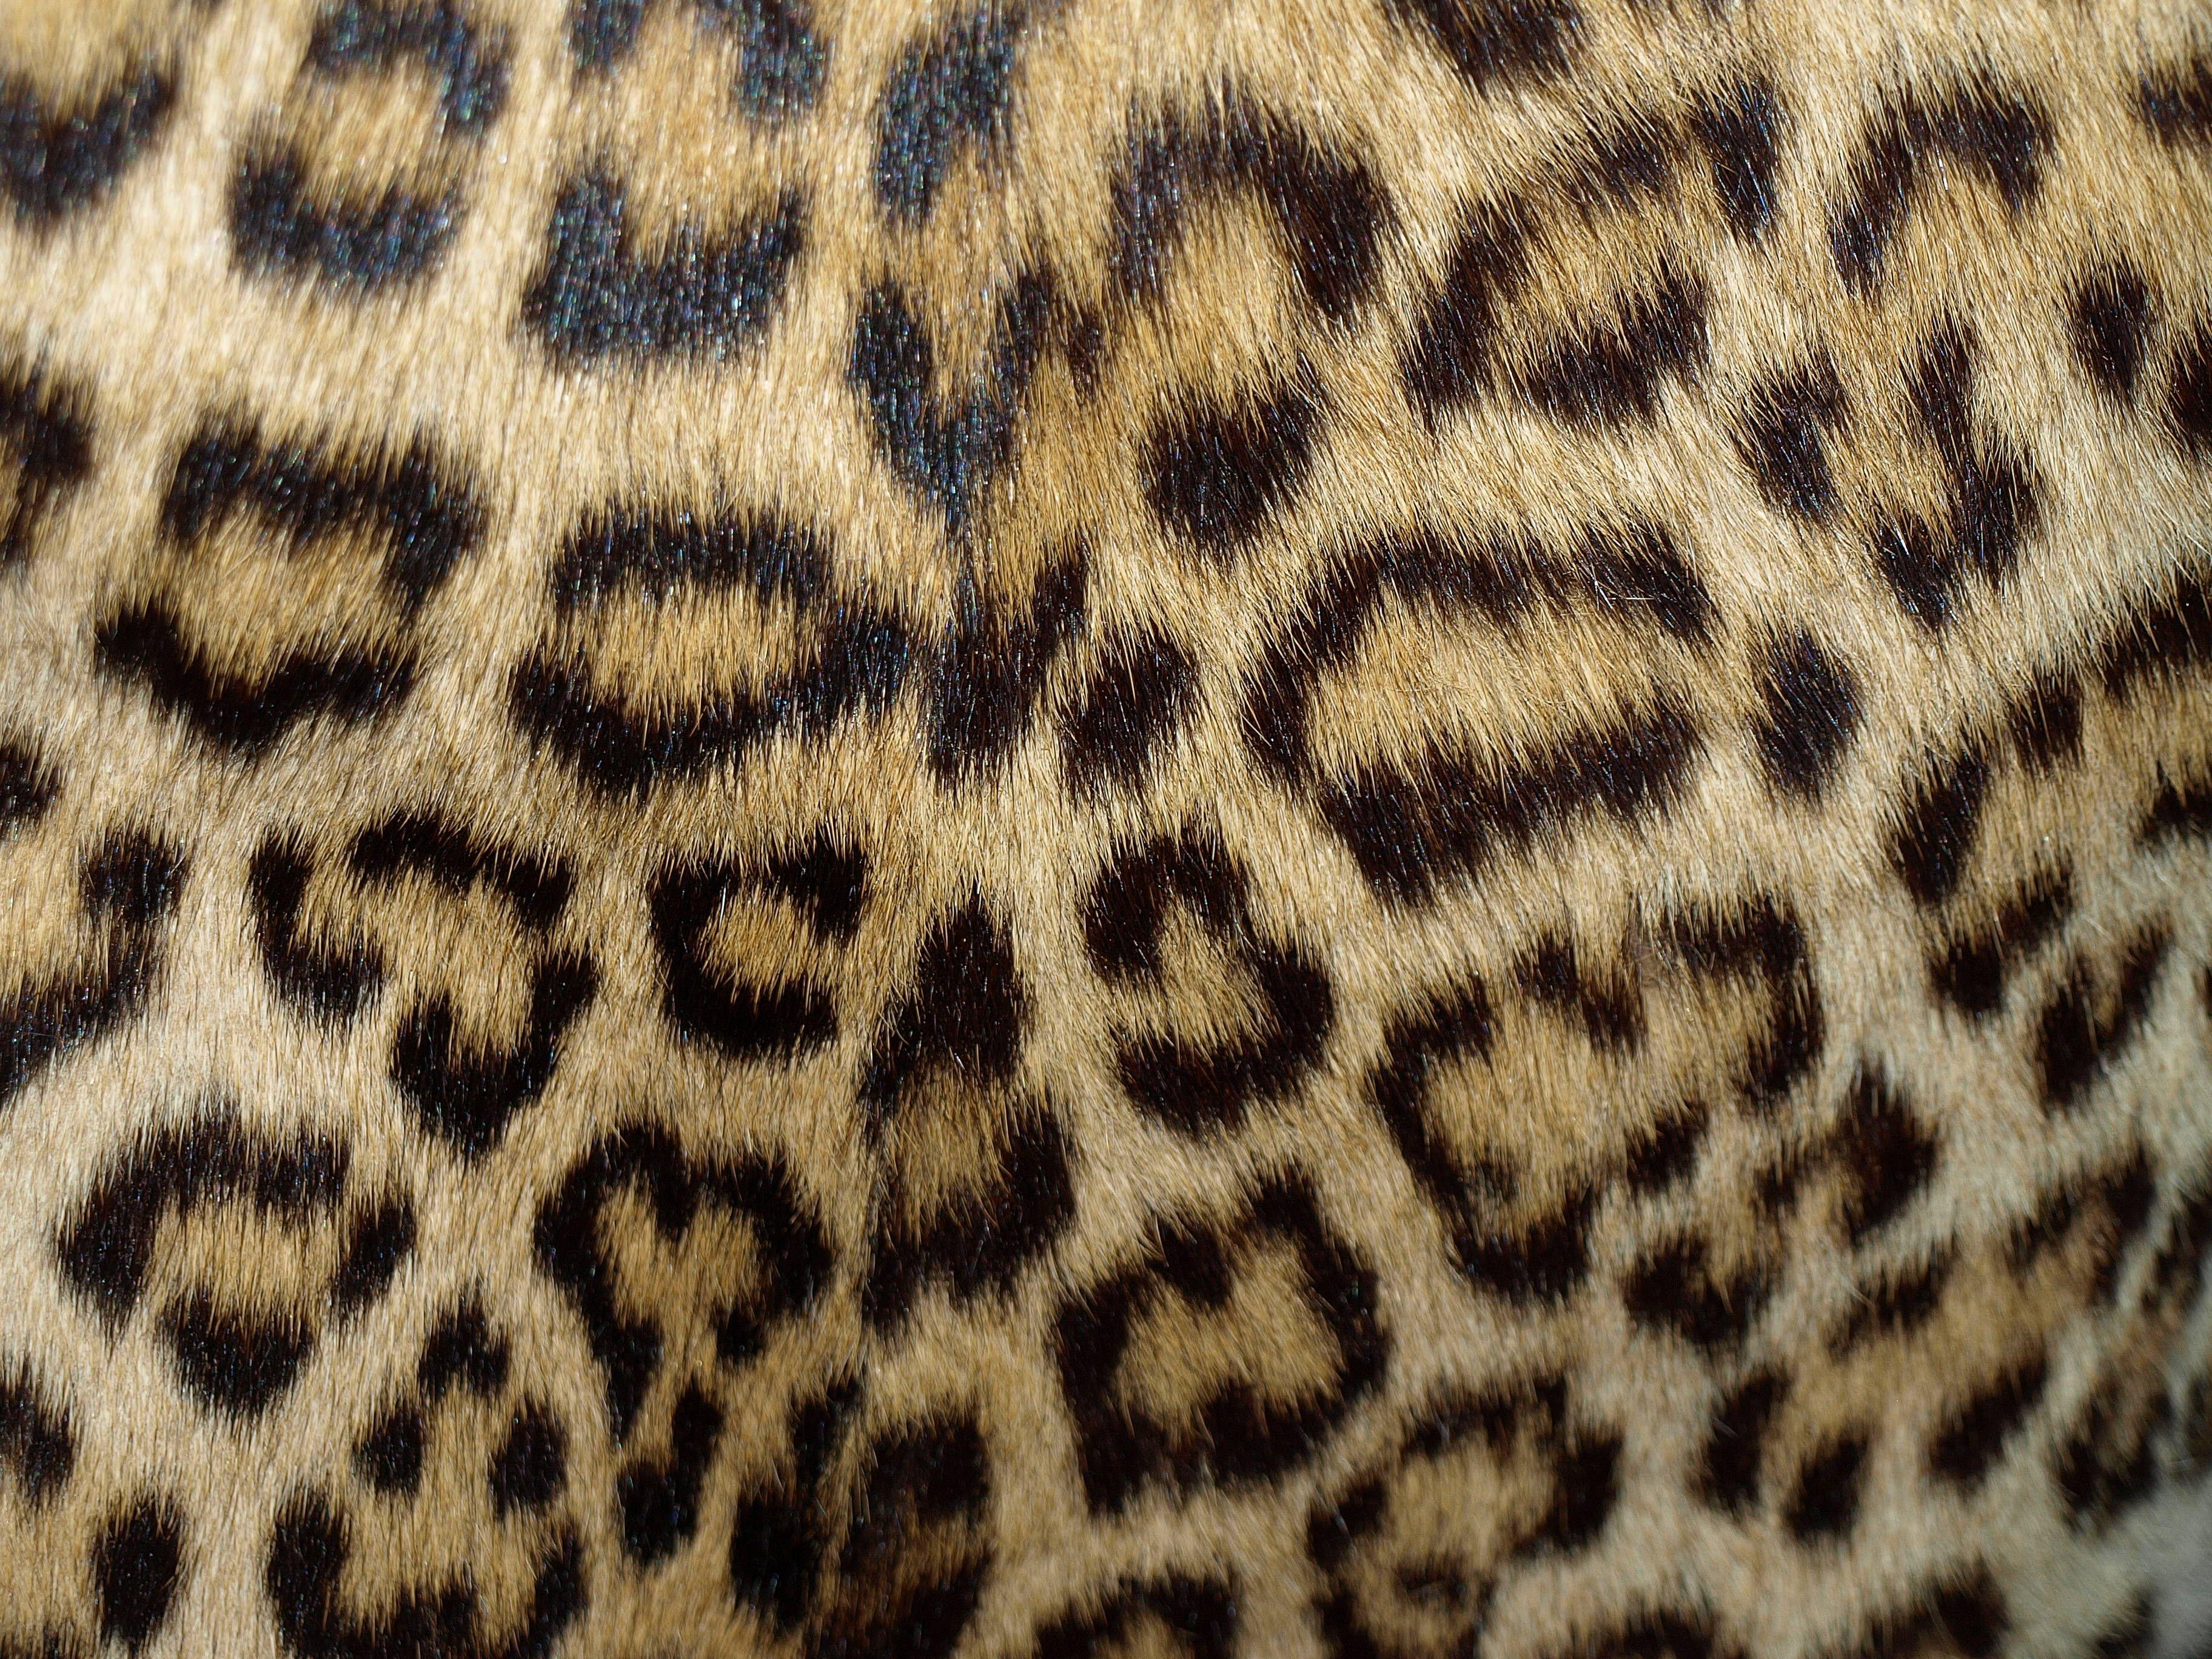 Leopard 2 wallpaper background hd wallpapers pinterest for Leopard print wallpaper